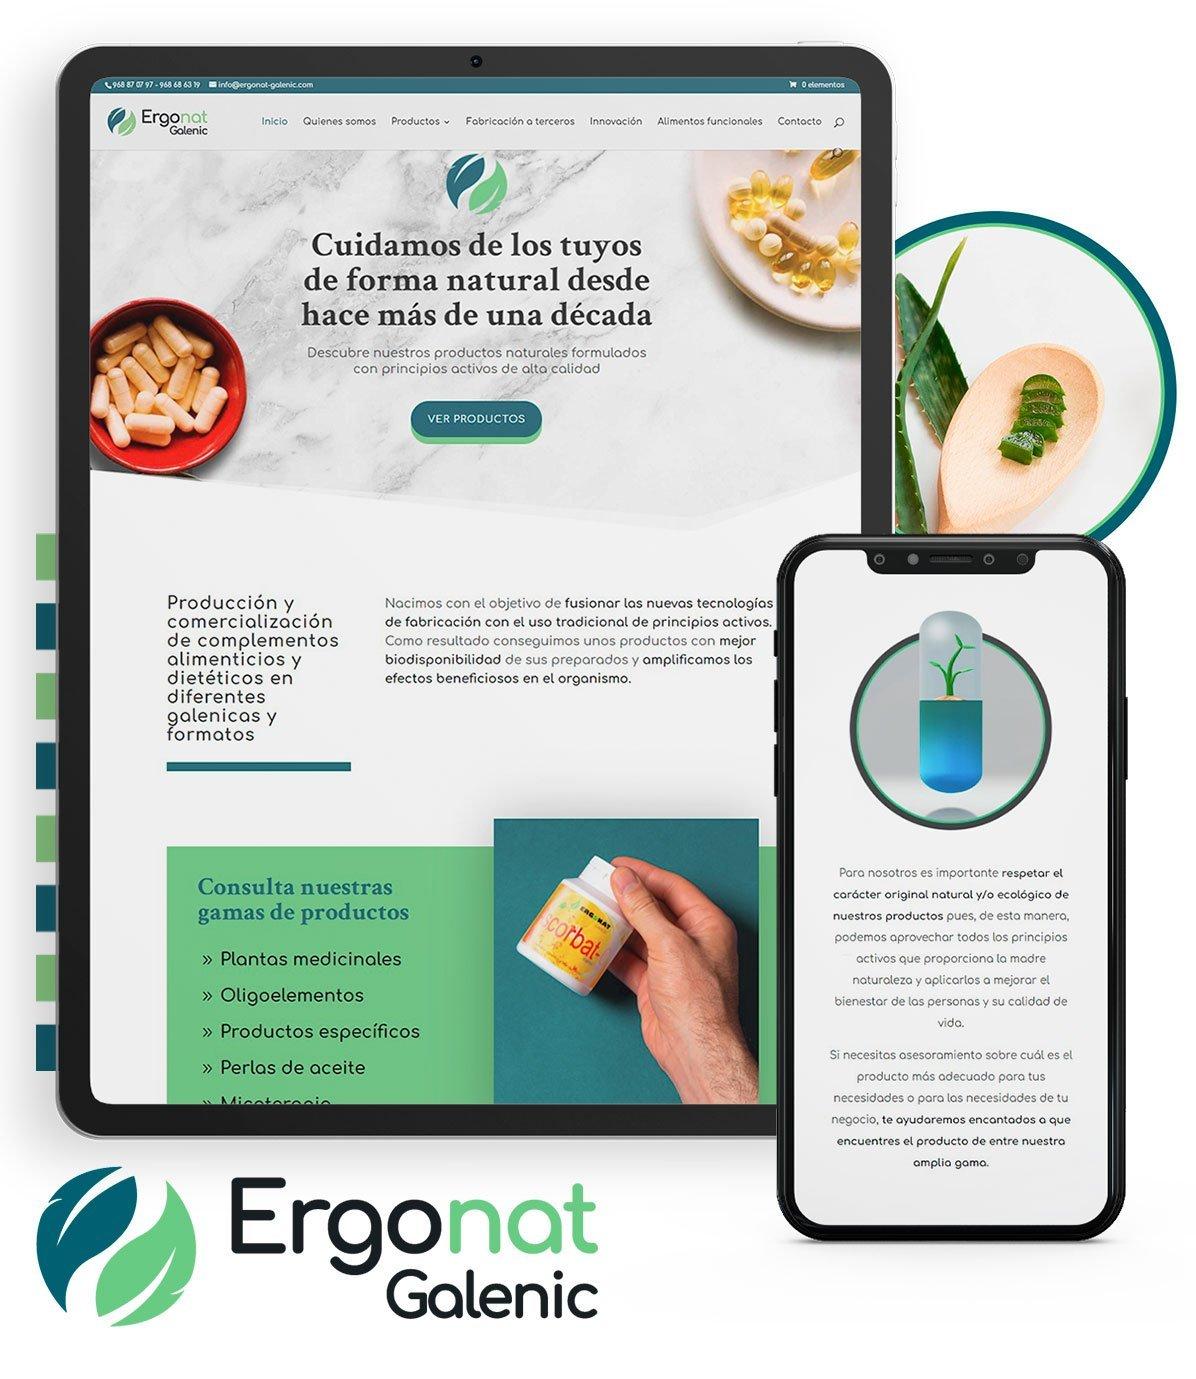 Ergonat-Galenic-Marketing-Digital-Web-Identidas-Corporativa-2VM